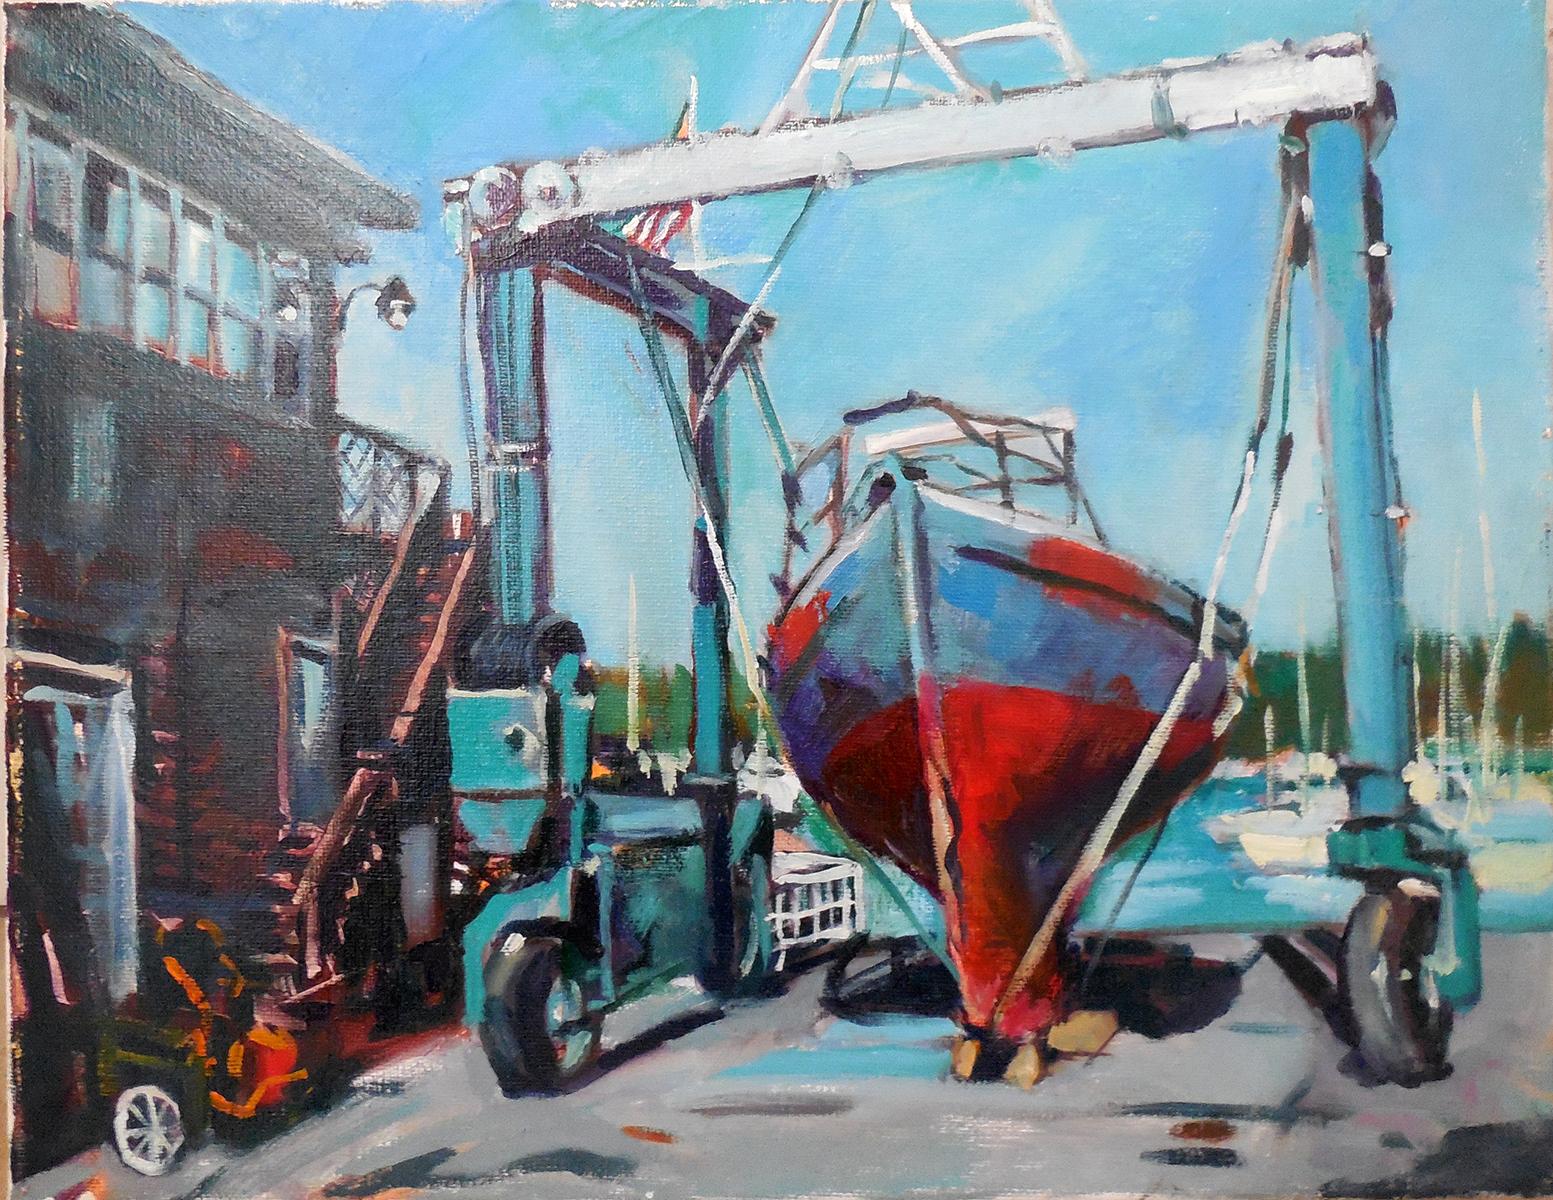 Marine Lift, Oil on canvas (11 x 14)